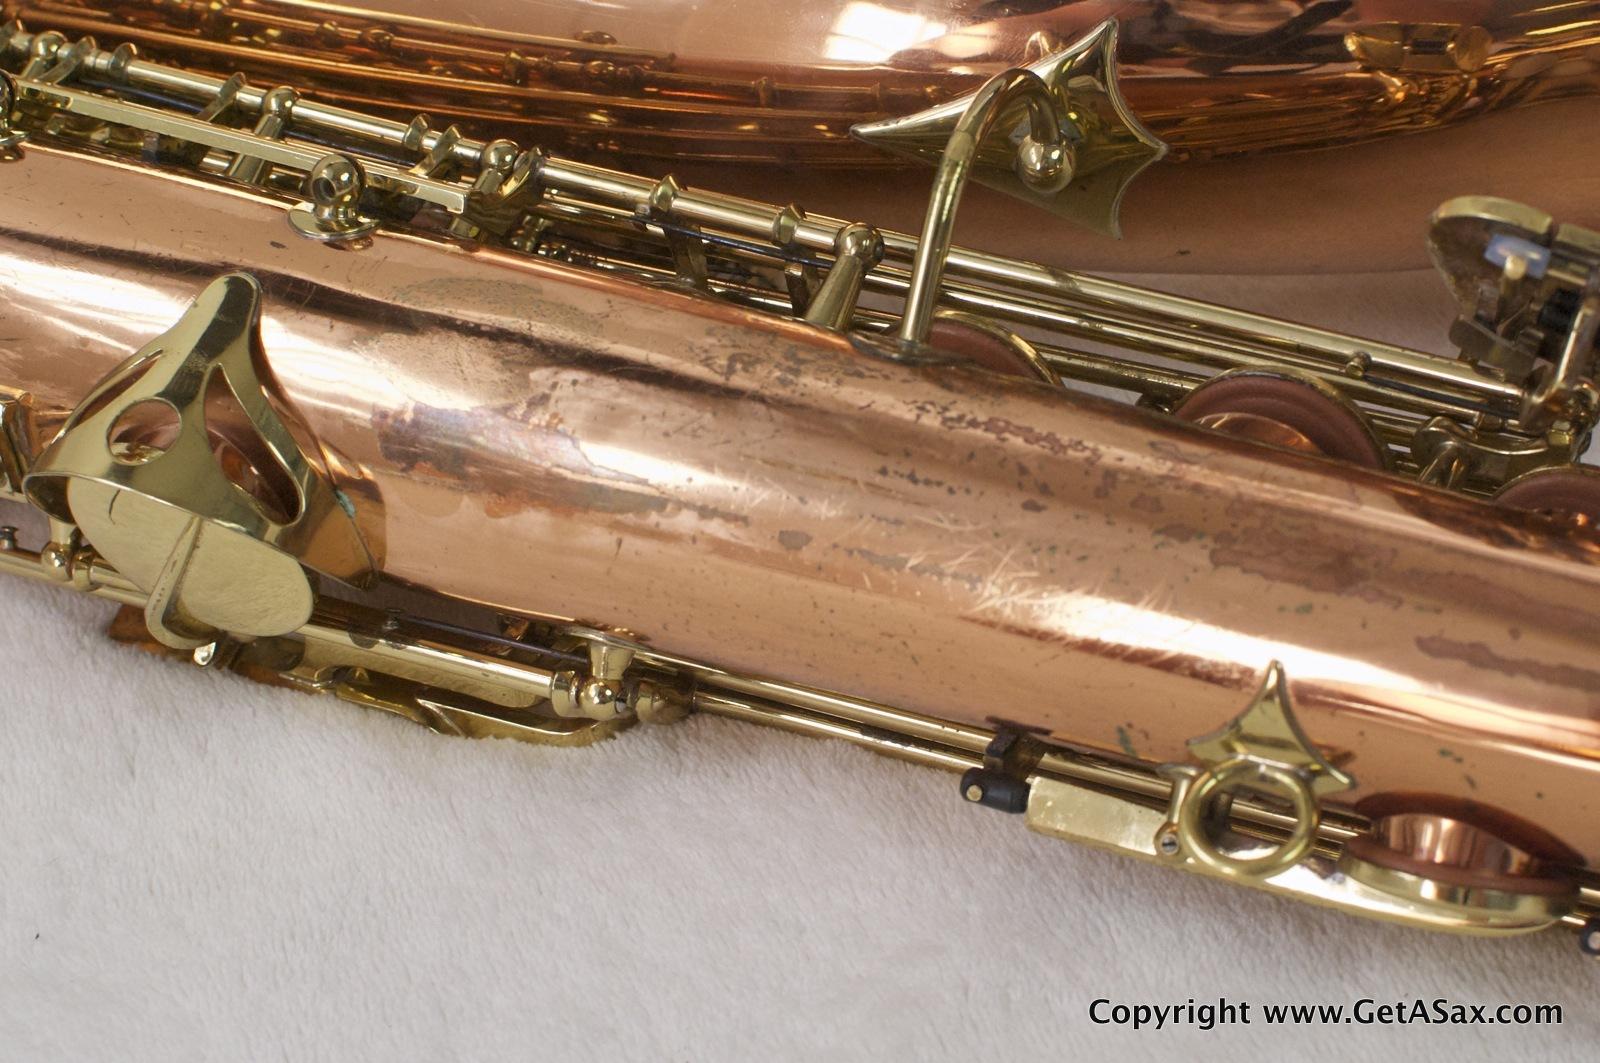 Buffet Prestige Tenor Saxophone Copper Body S-1 / S-3 ...